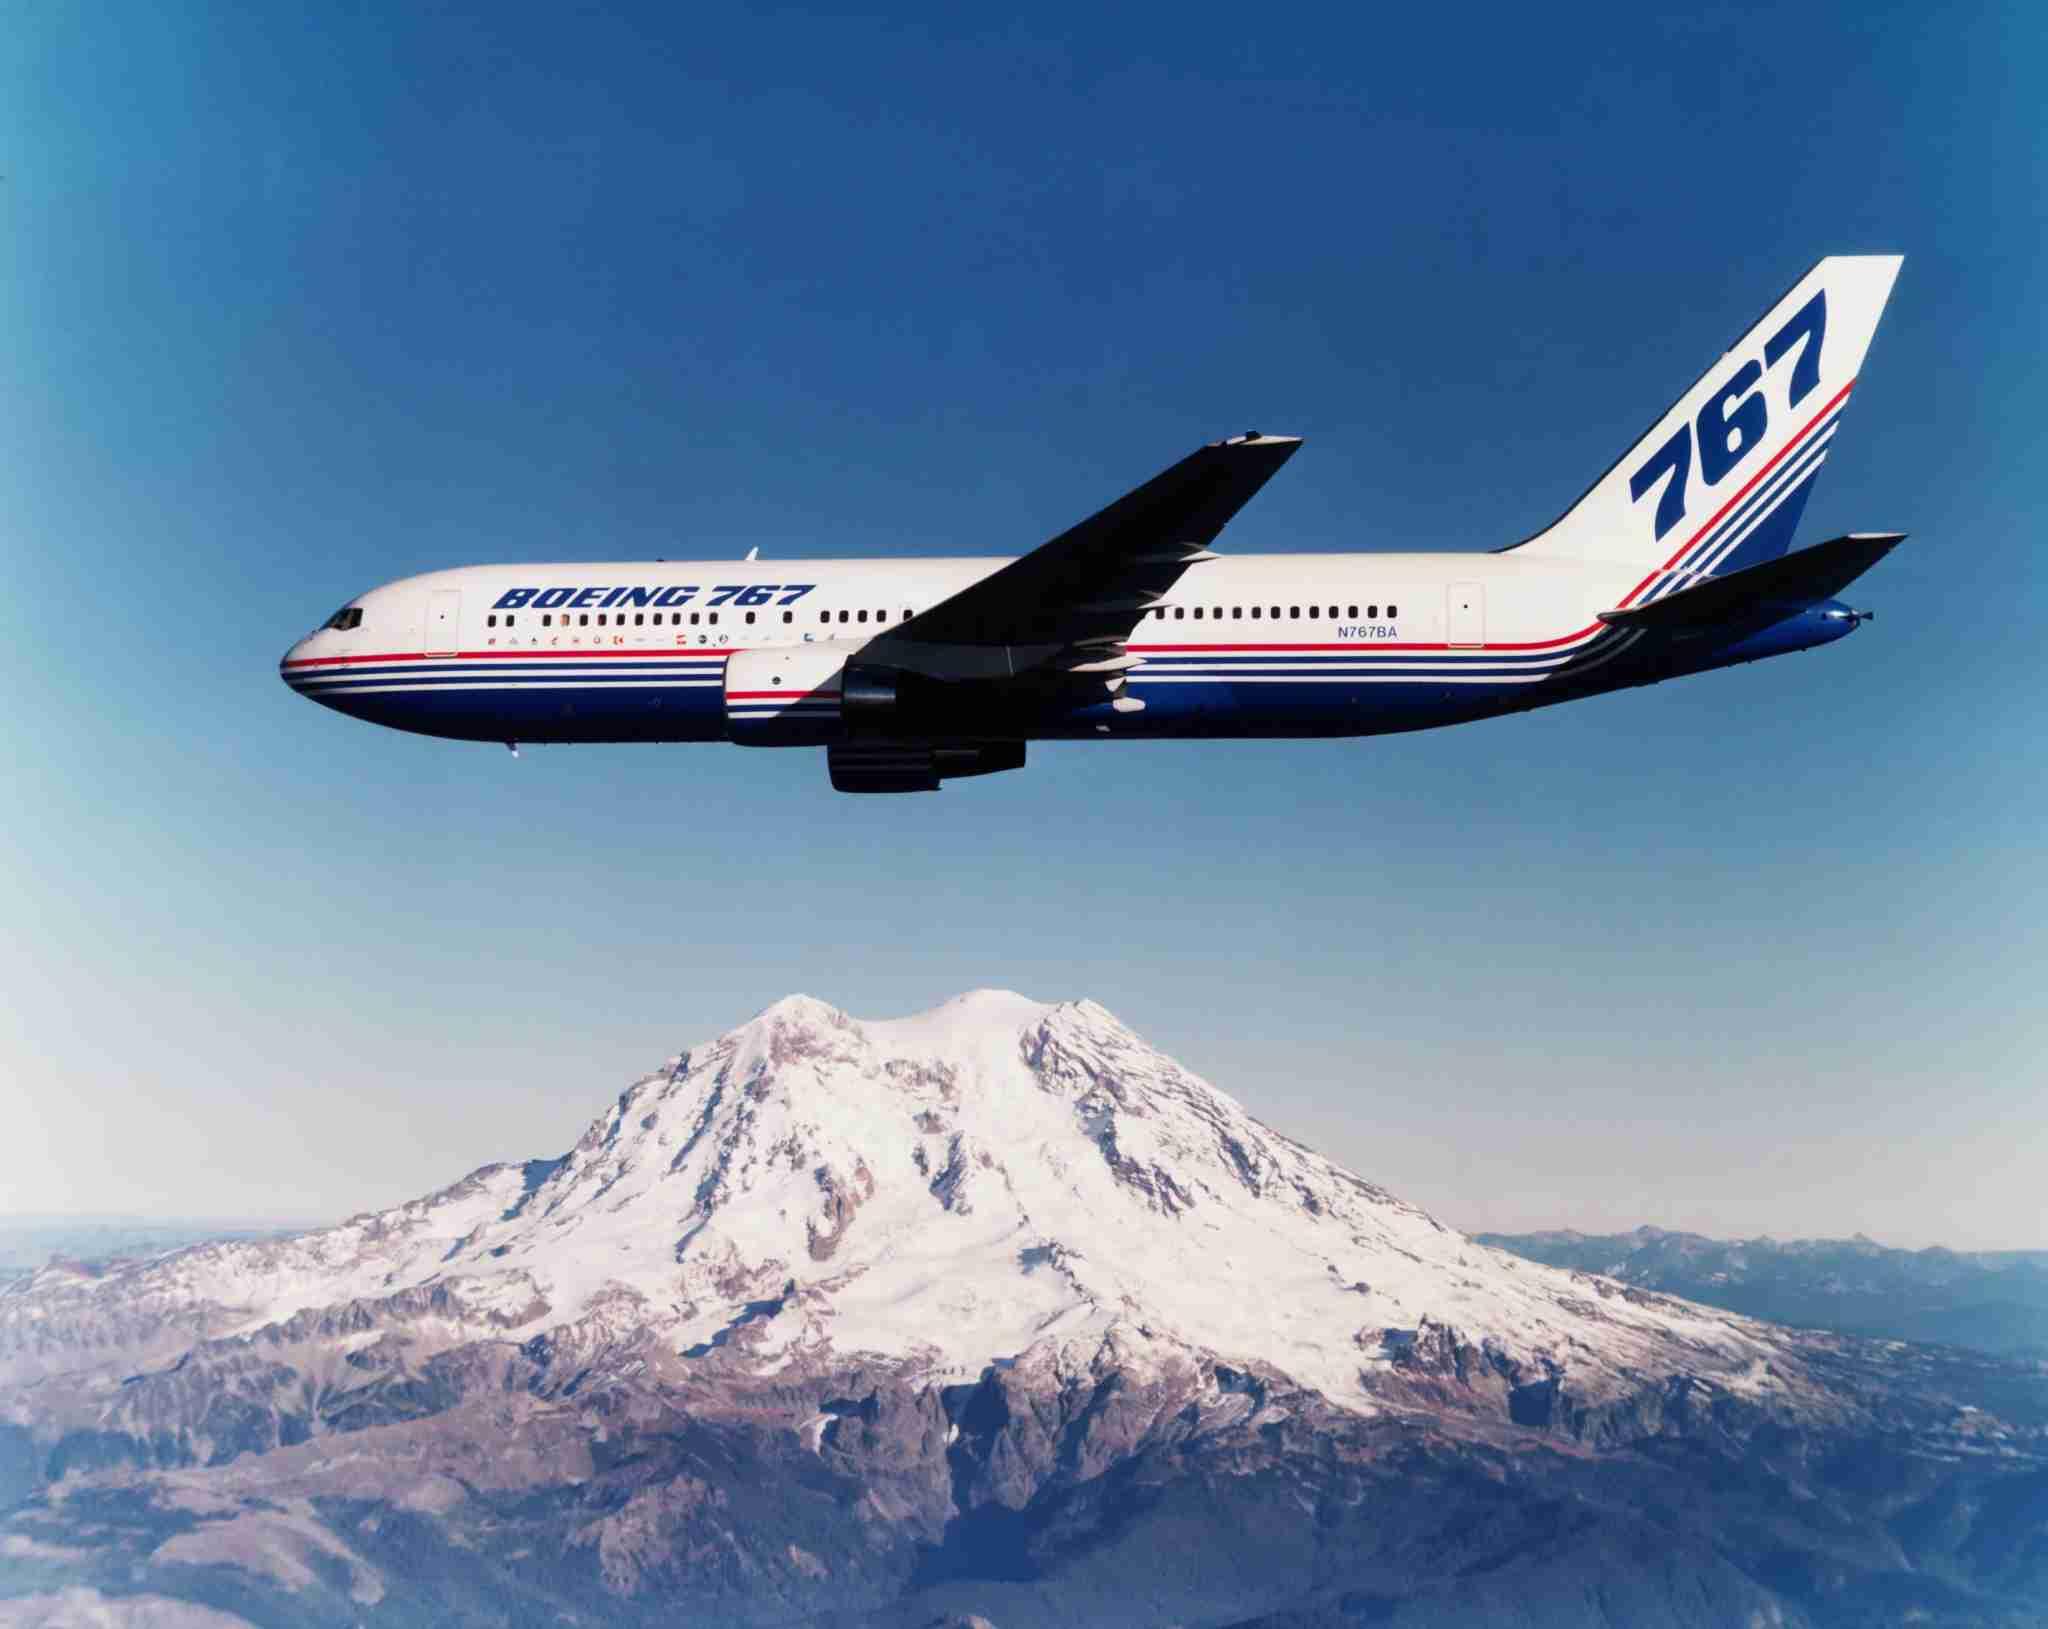 A Boeing 767-200B prototype jet flies near Mount Rainier. Washington, 1980s. (Photo by © Museum of Flight/CORBIS/Corbis via Getty Images)